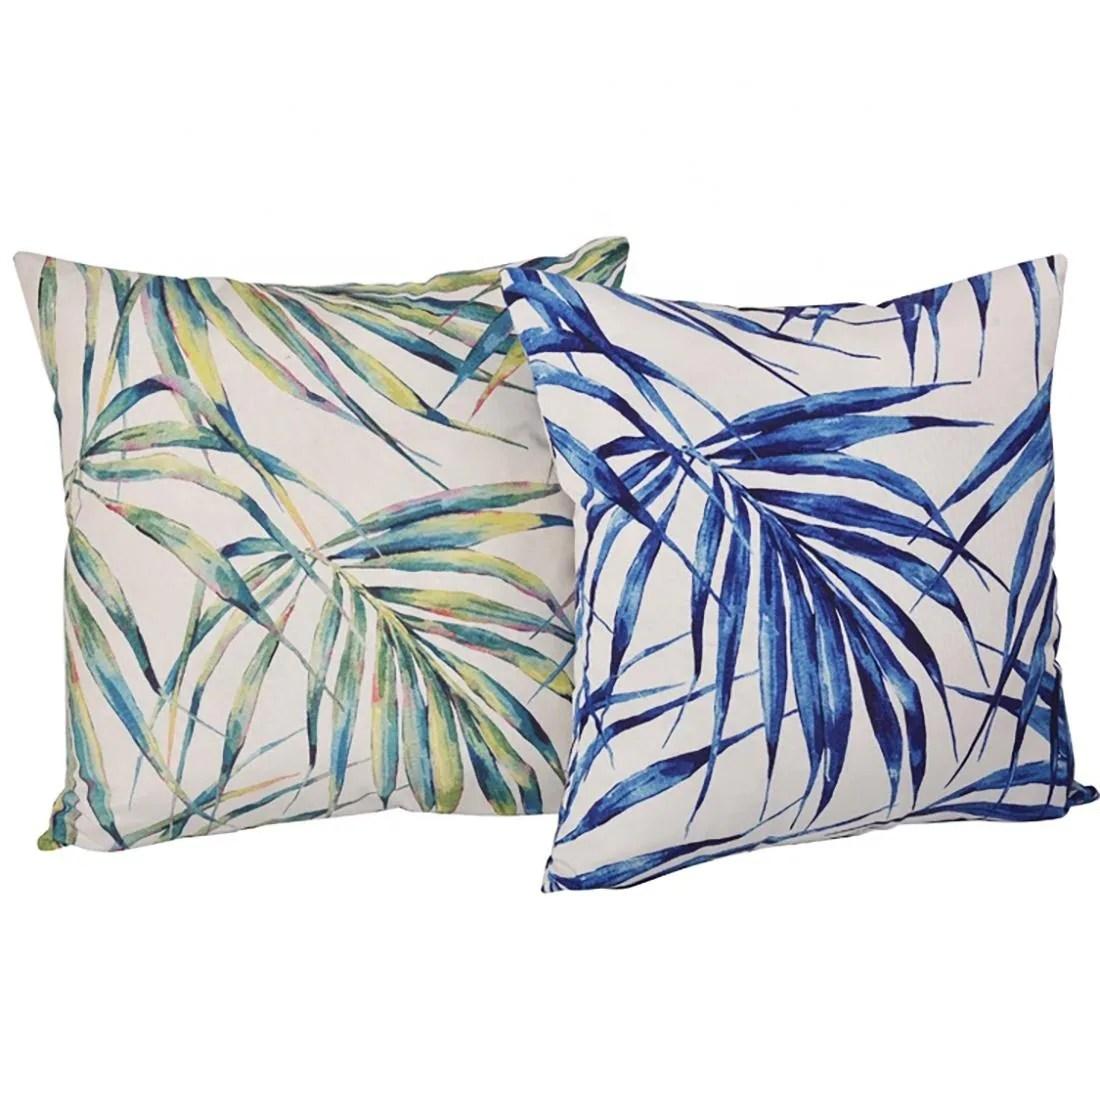 elegant design tropical leaves waterproof indoor outdoor decorative pillow cover 18 x 18